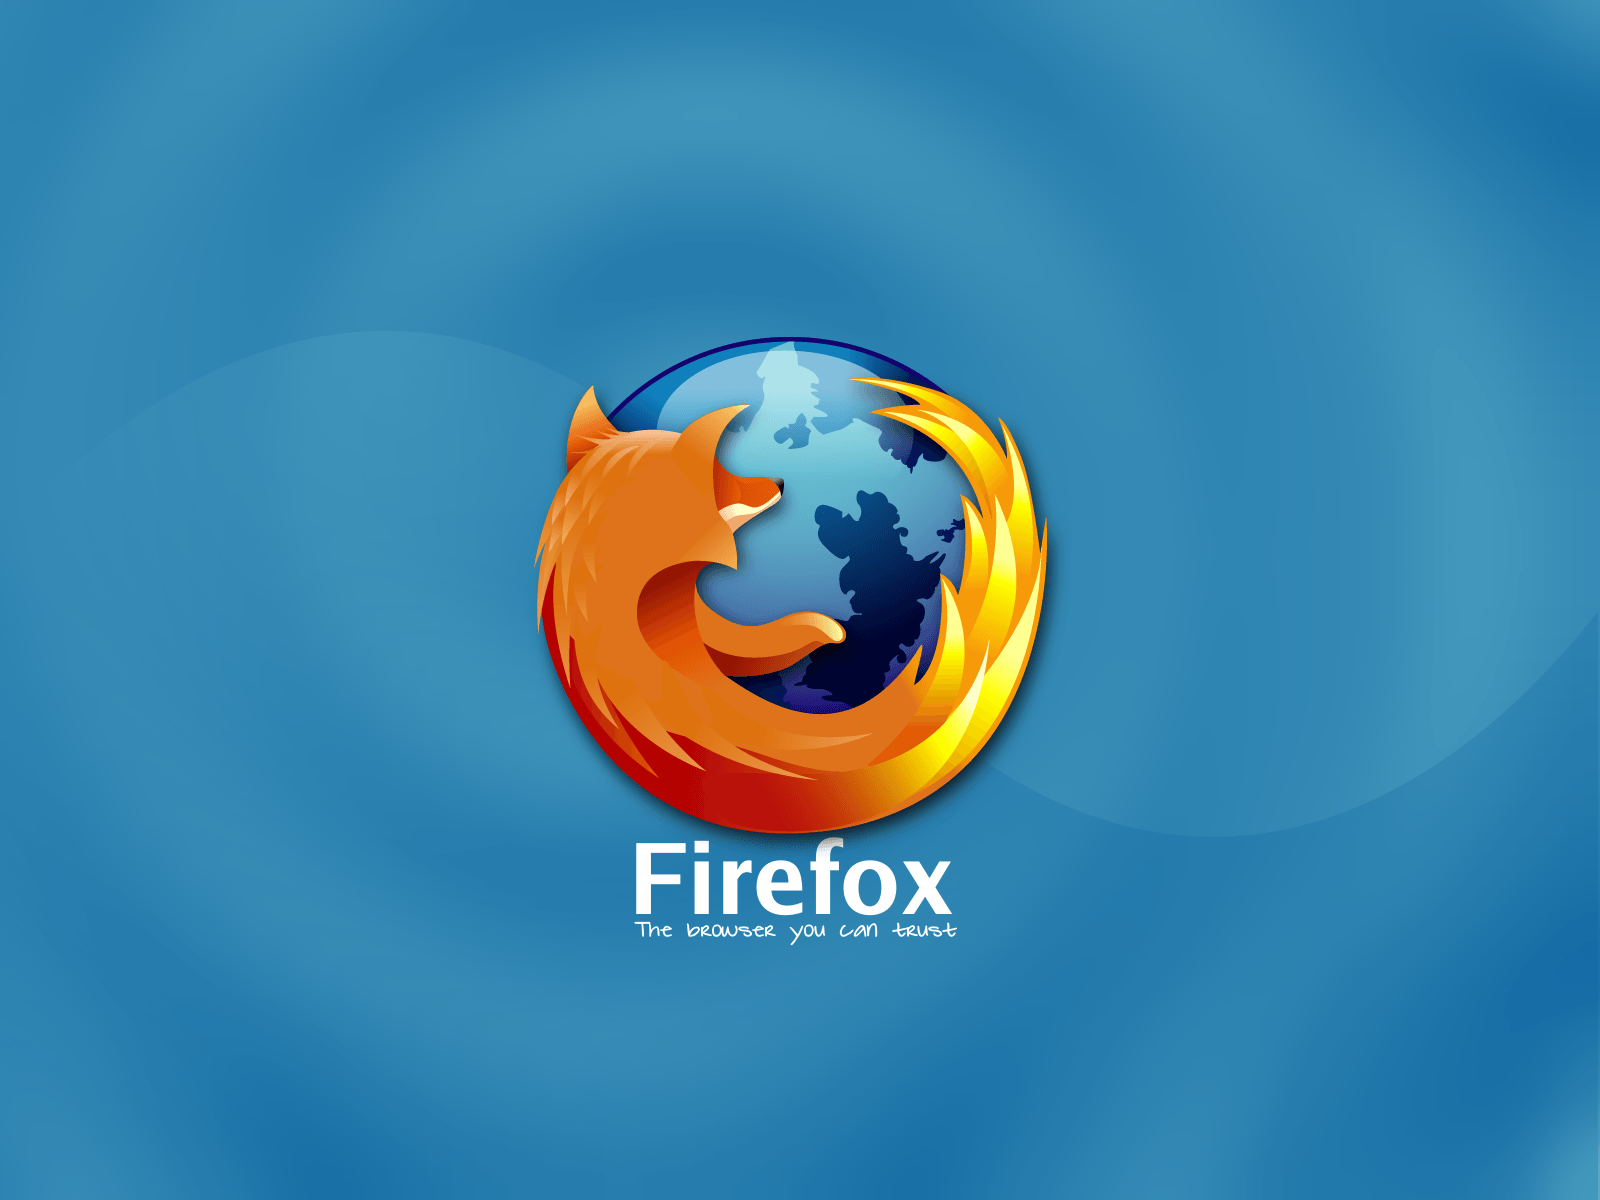 Desactivar caché en Firefox